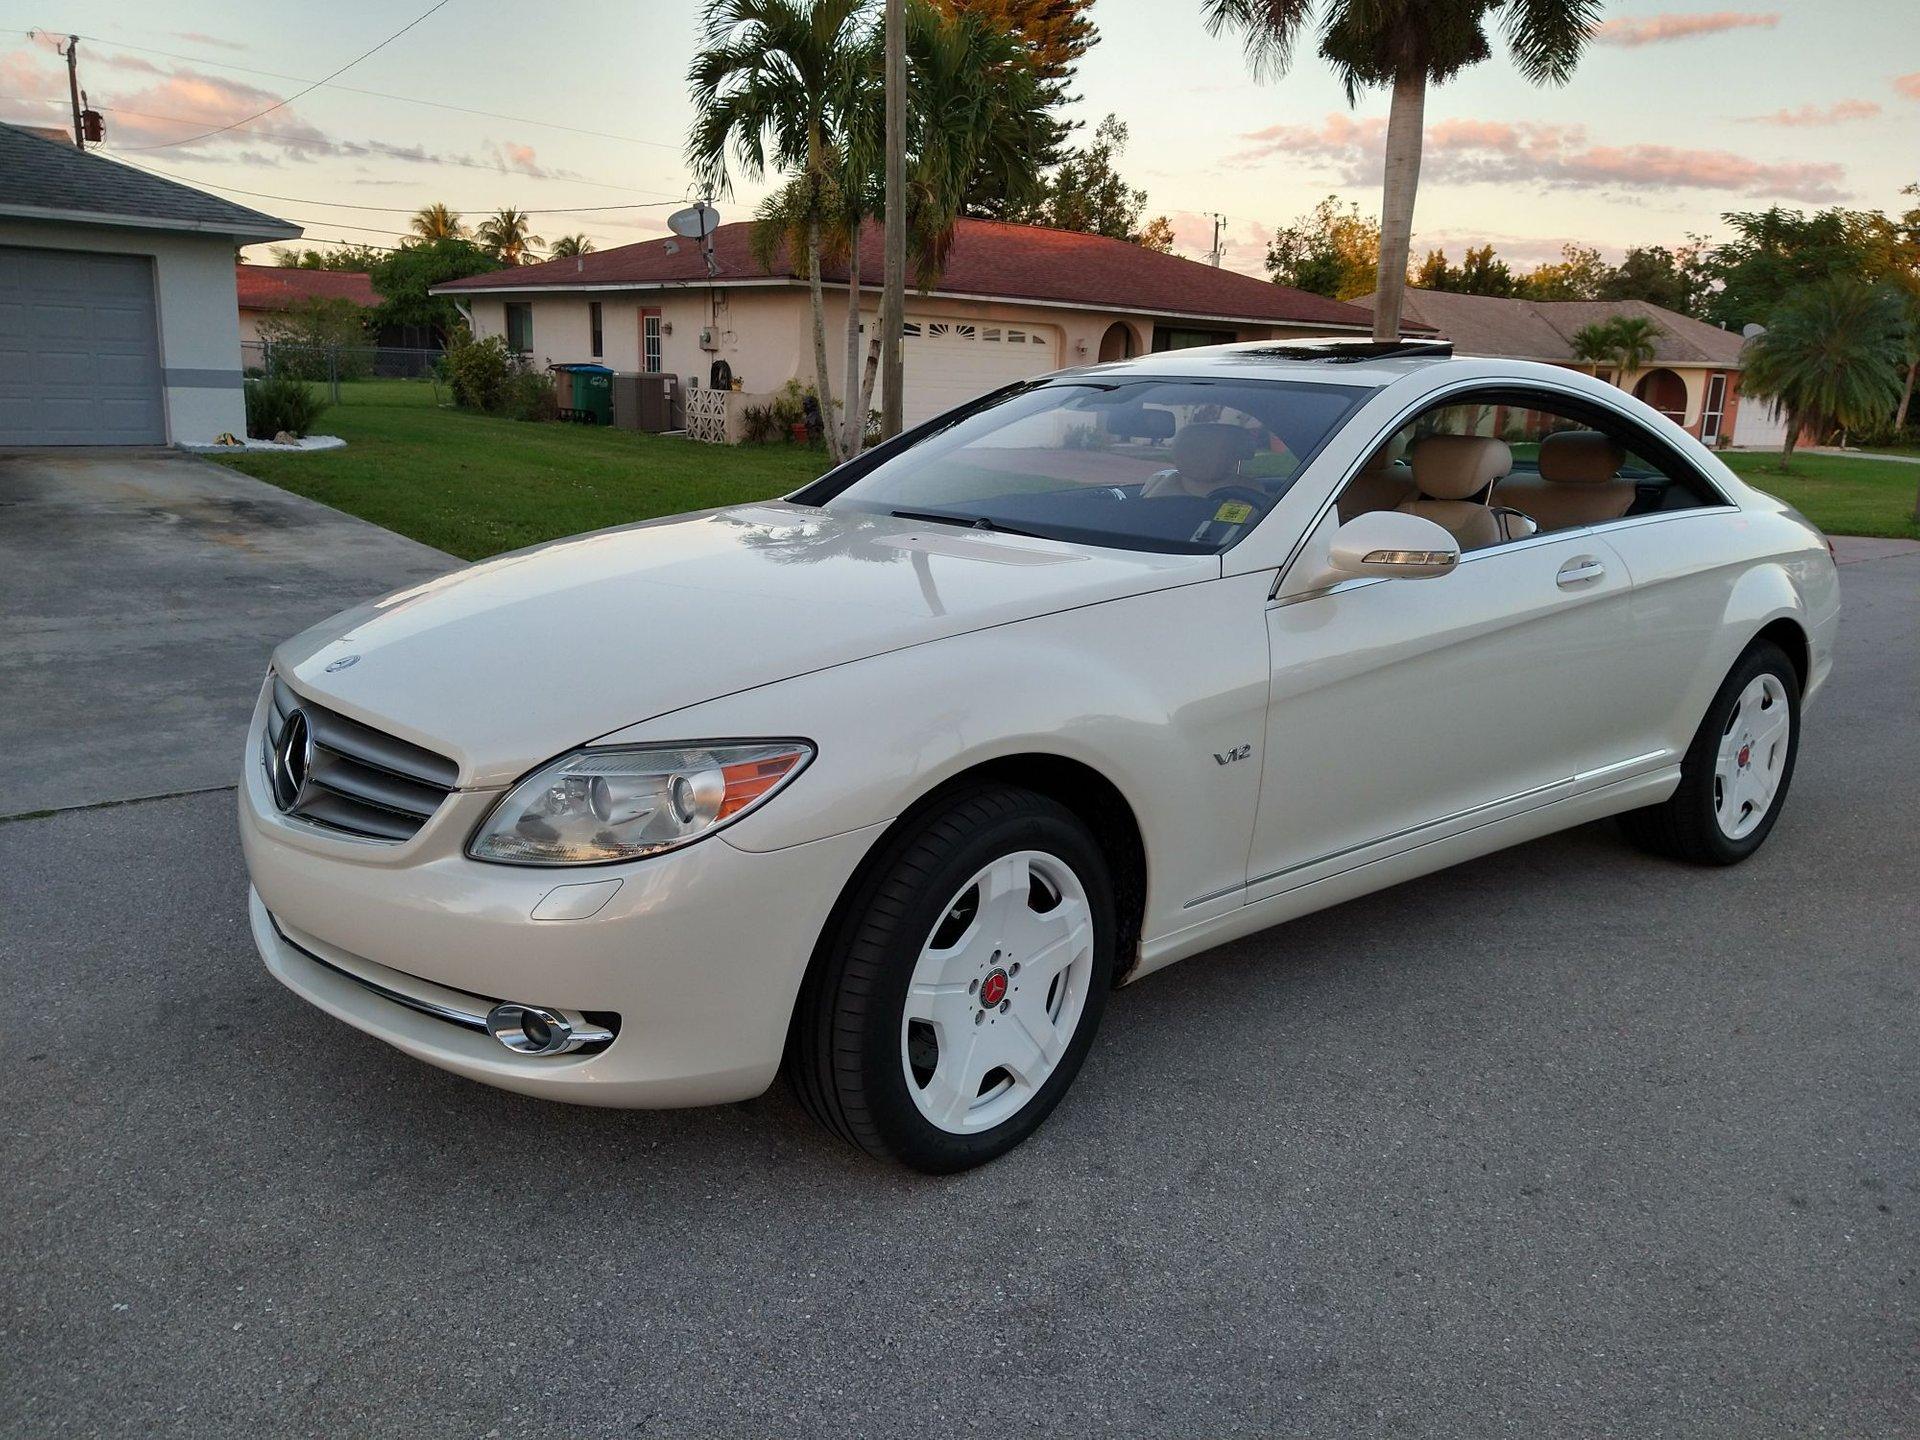 2007 mercedes benz cl600 designo edit coupe